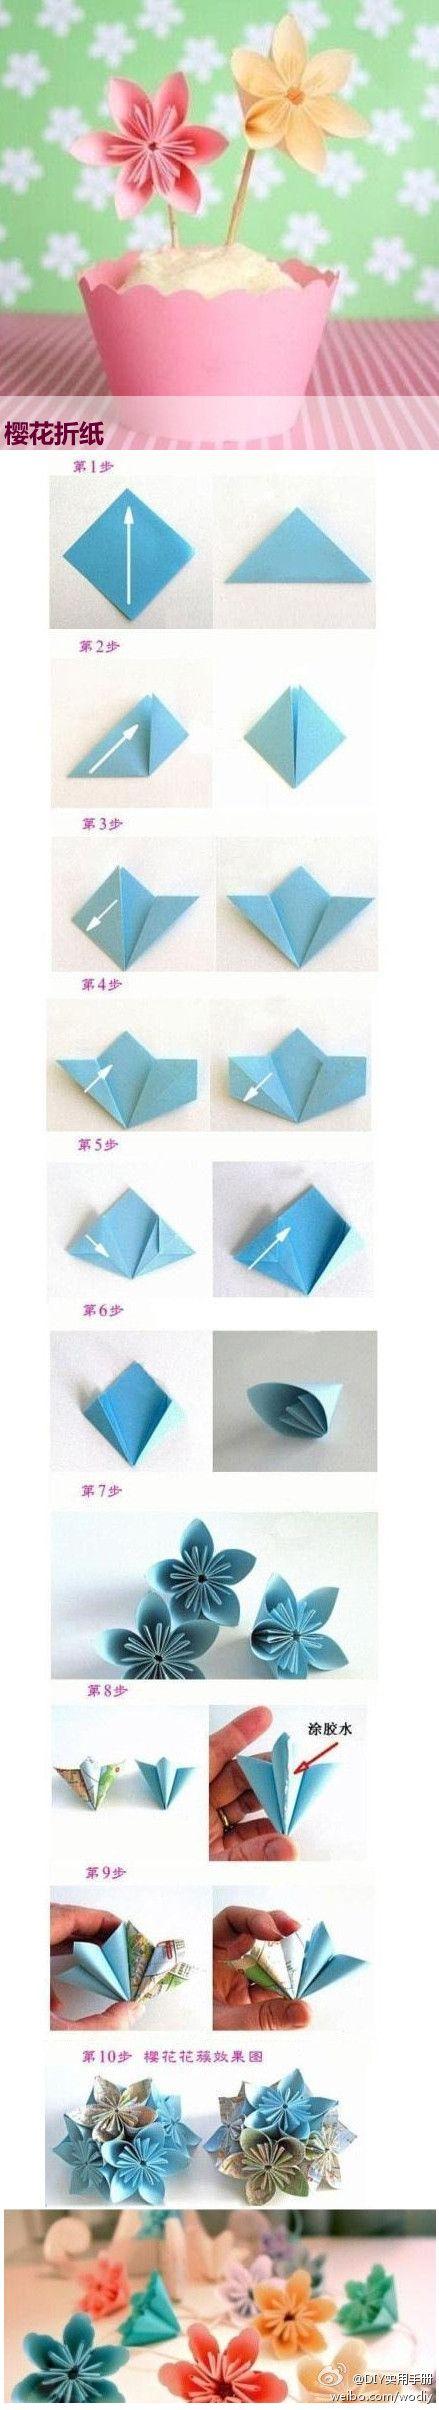 Flower Origami Origami Paper Making Paper Folding Japanese